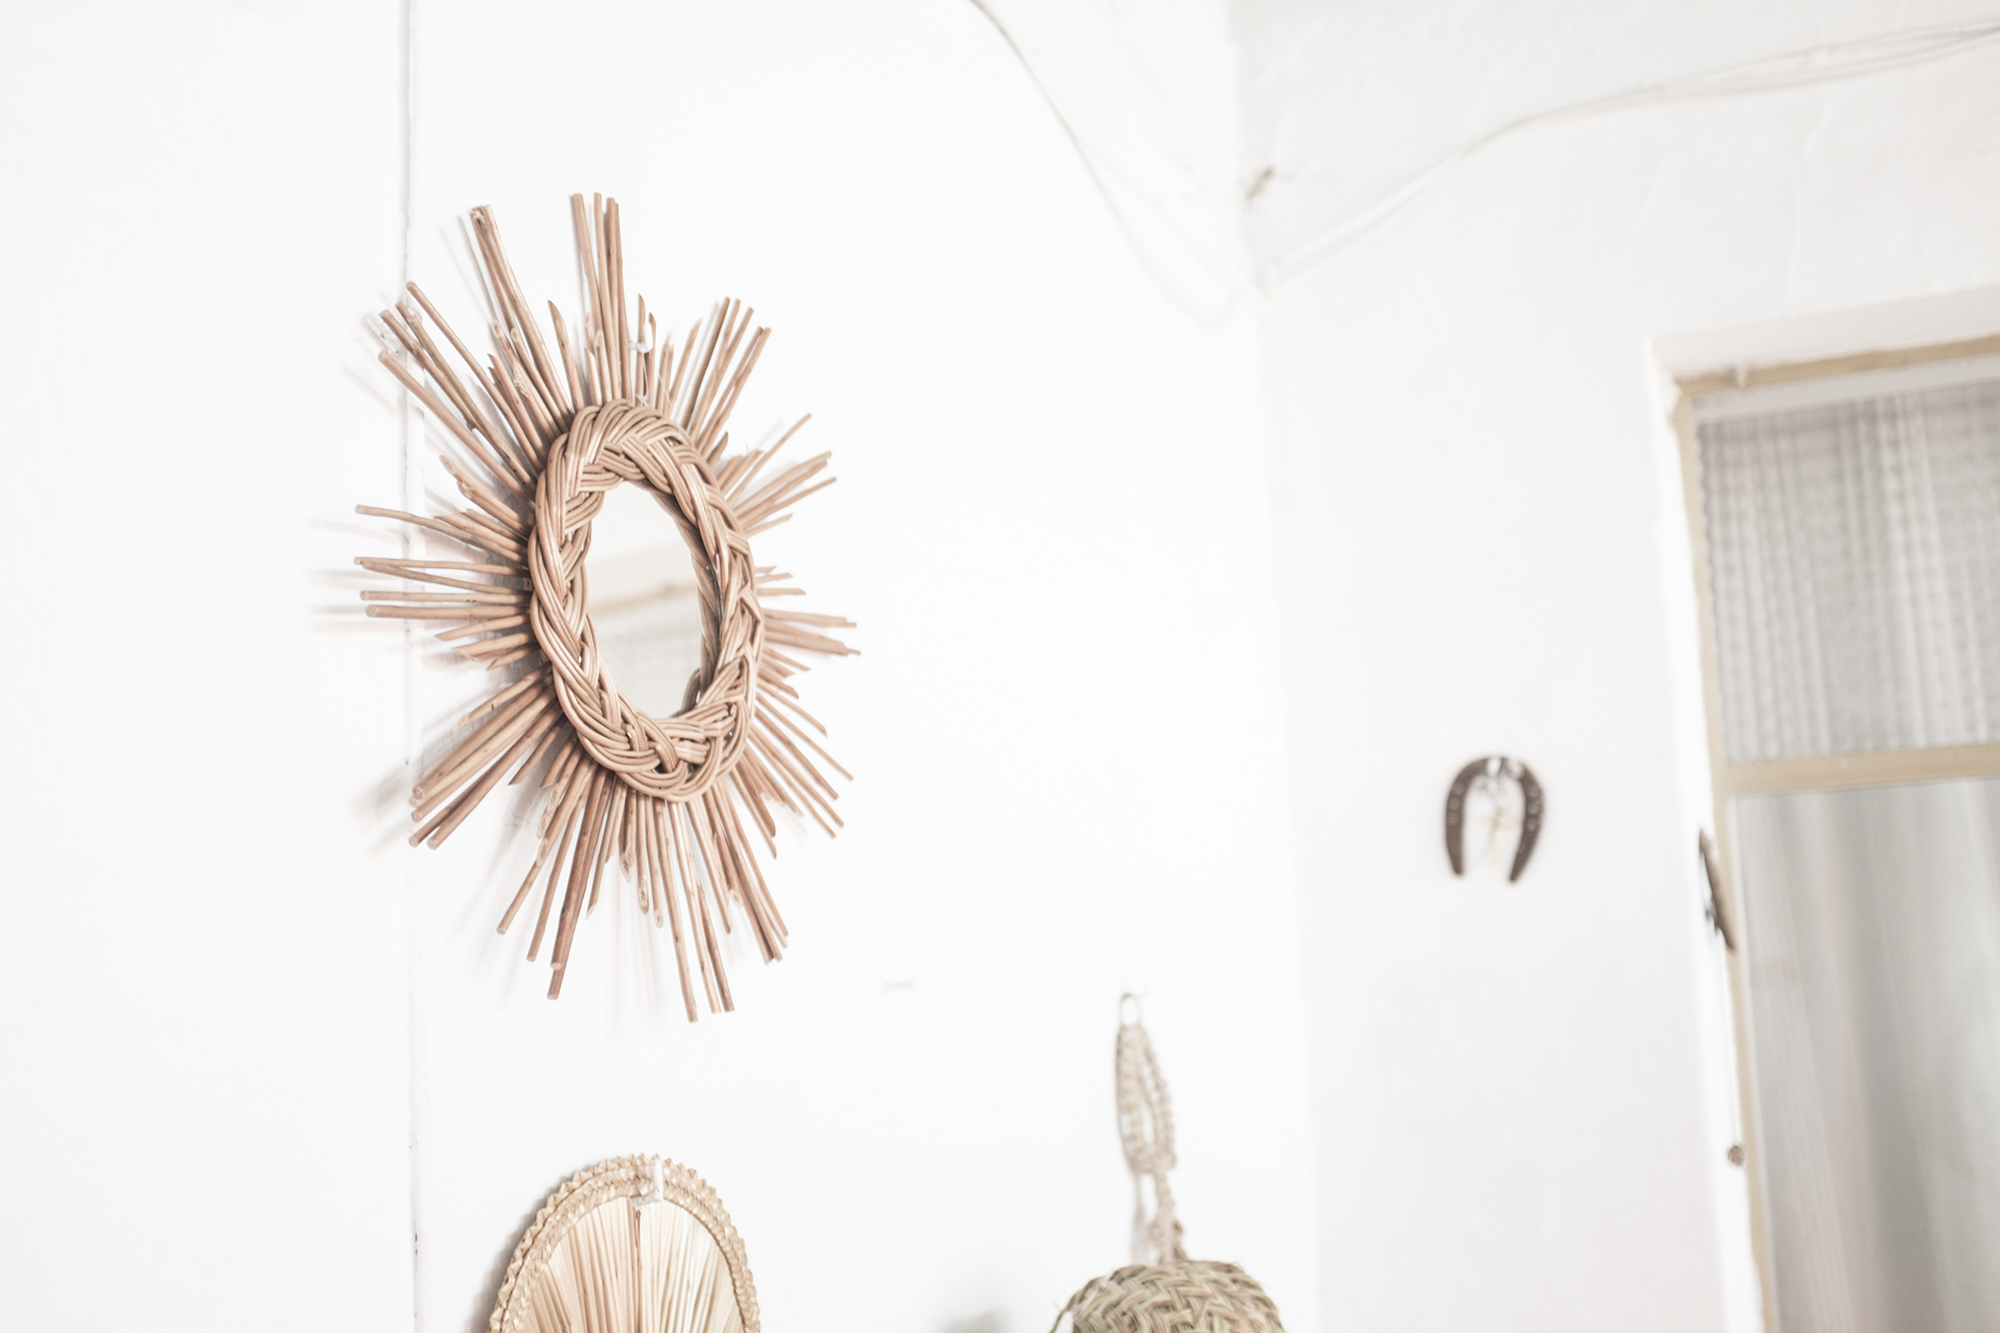 espejo retro forma de sol fibra natural artesanía española pipolart